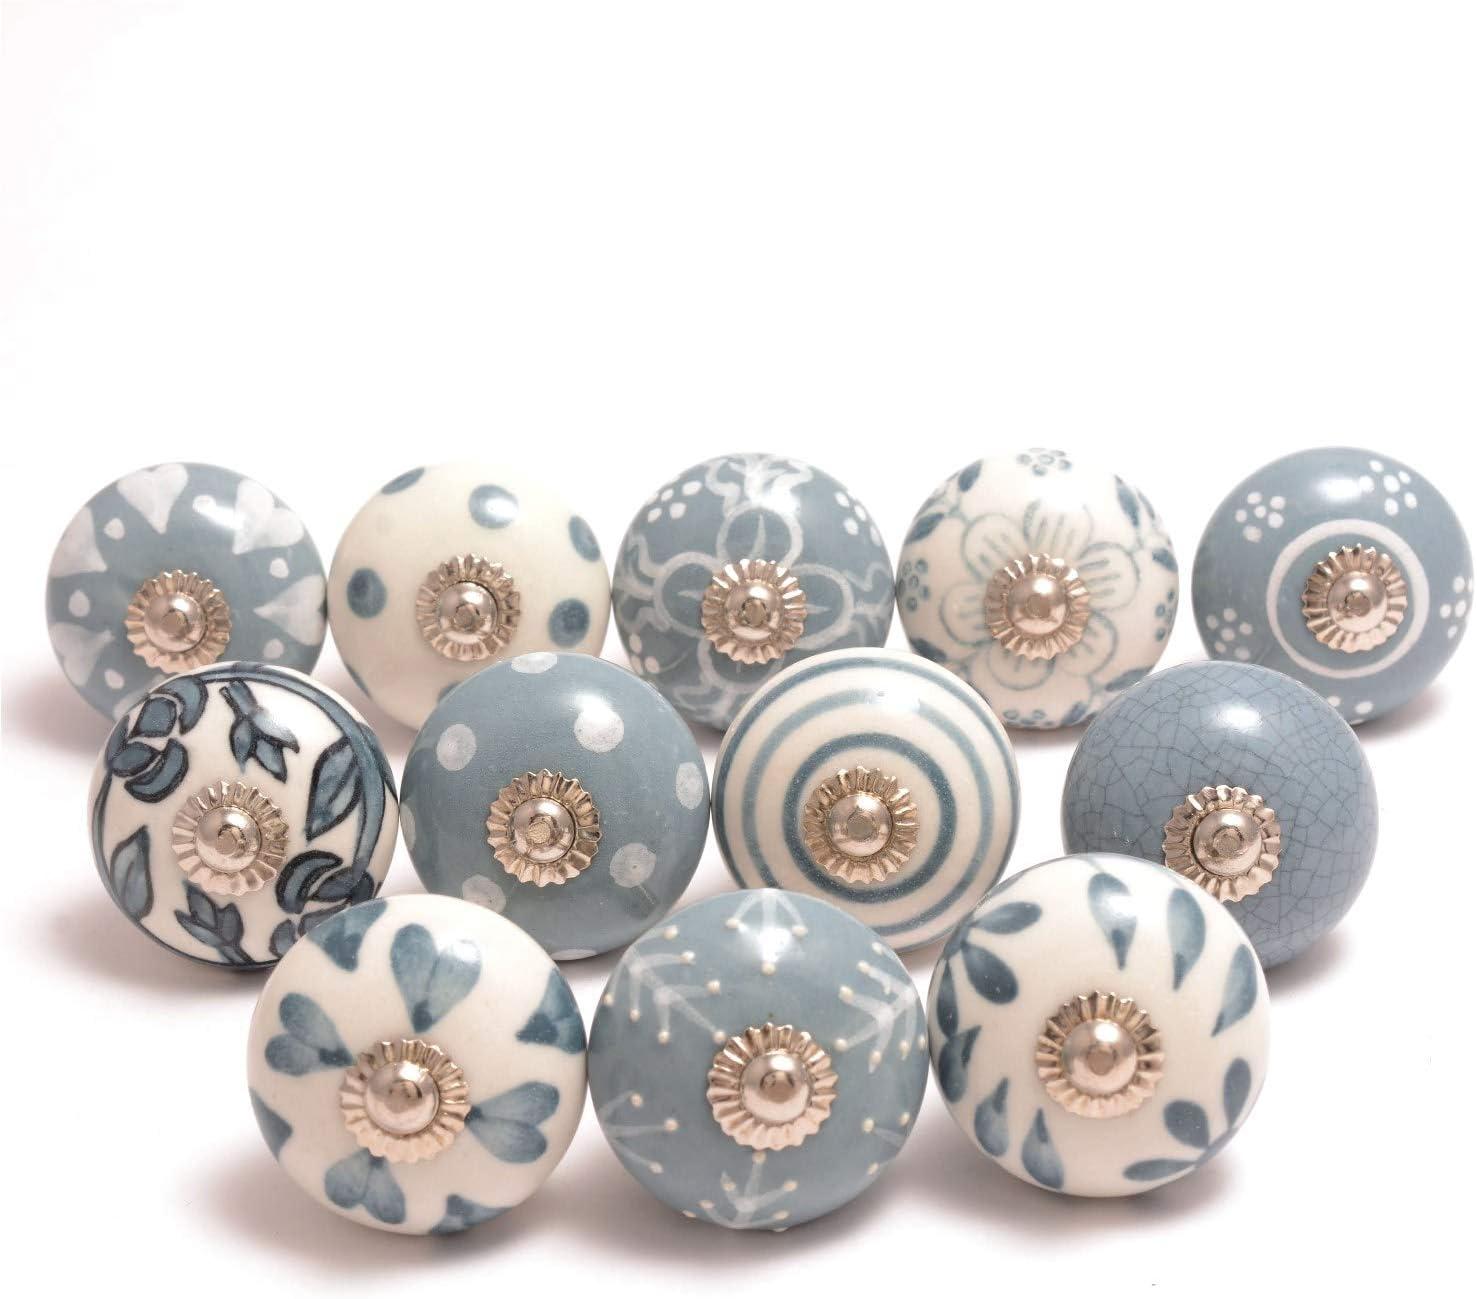 Vintage Round White Porcelain Drawer Cabinet Knobs Pulls w//hardware